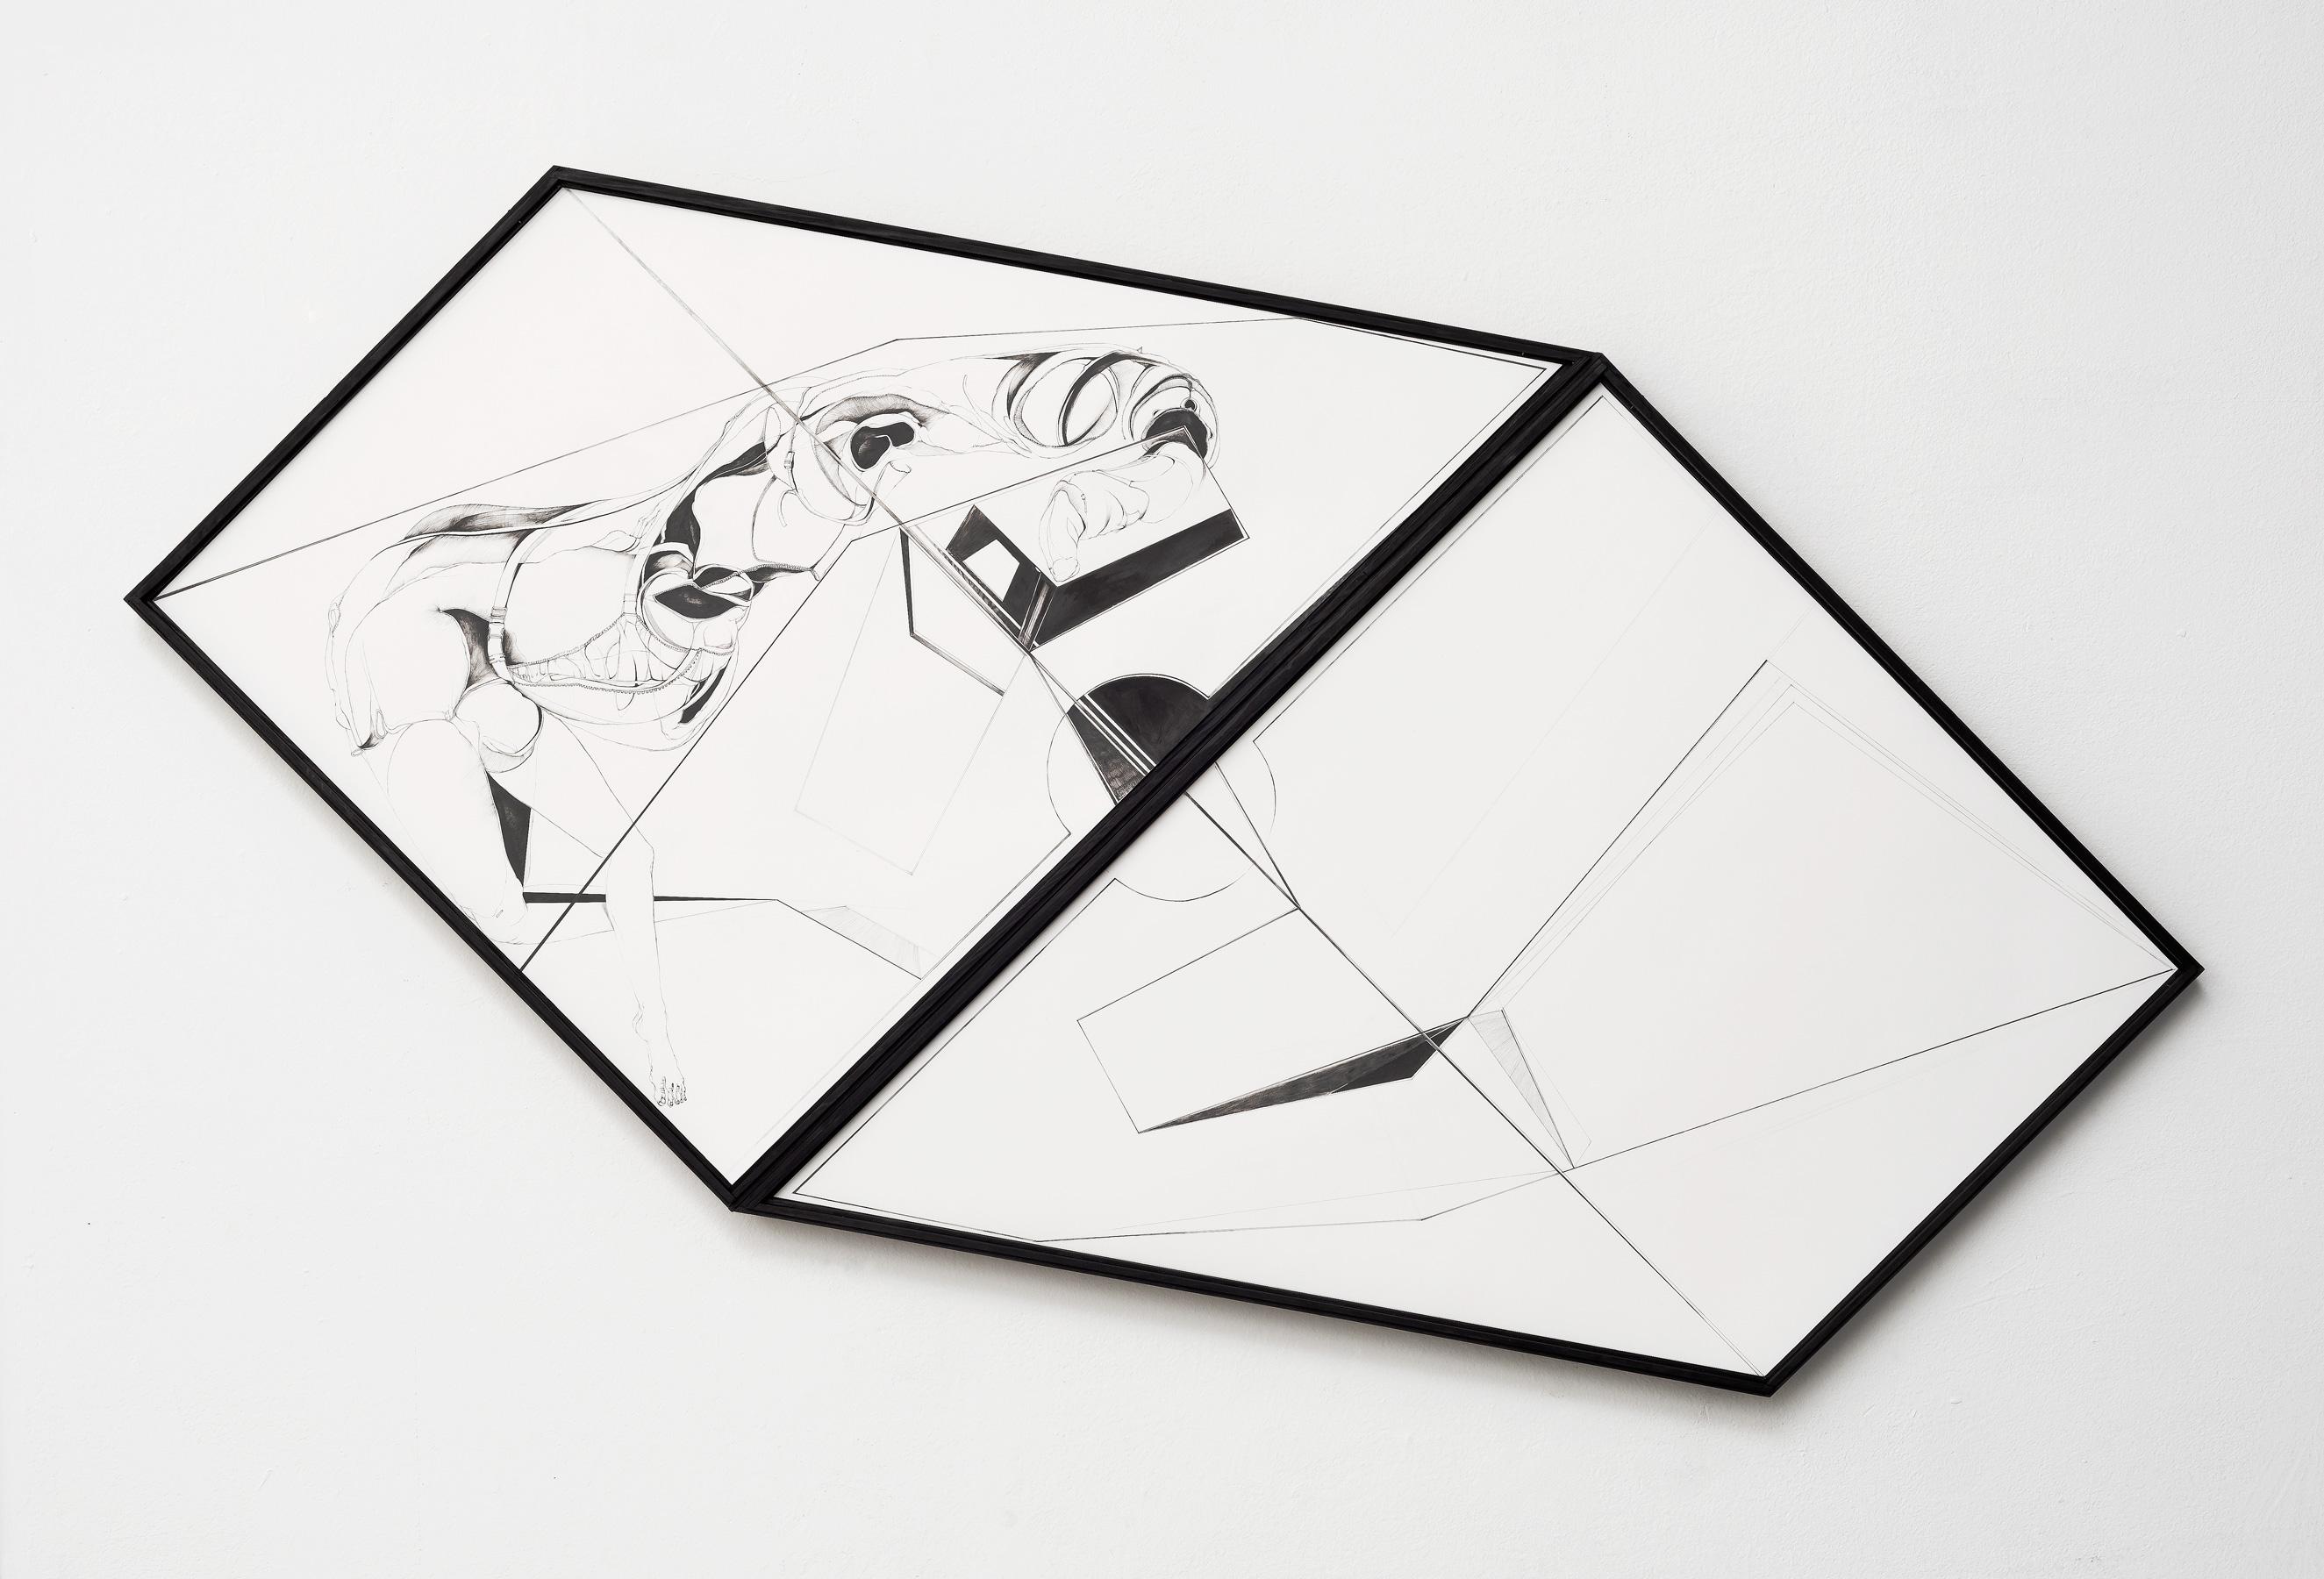 Nina Annabelle Märkl | Scapes 4 | Ink on paper, cutouts, wood | 145 x 89 cm | 2014